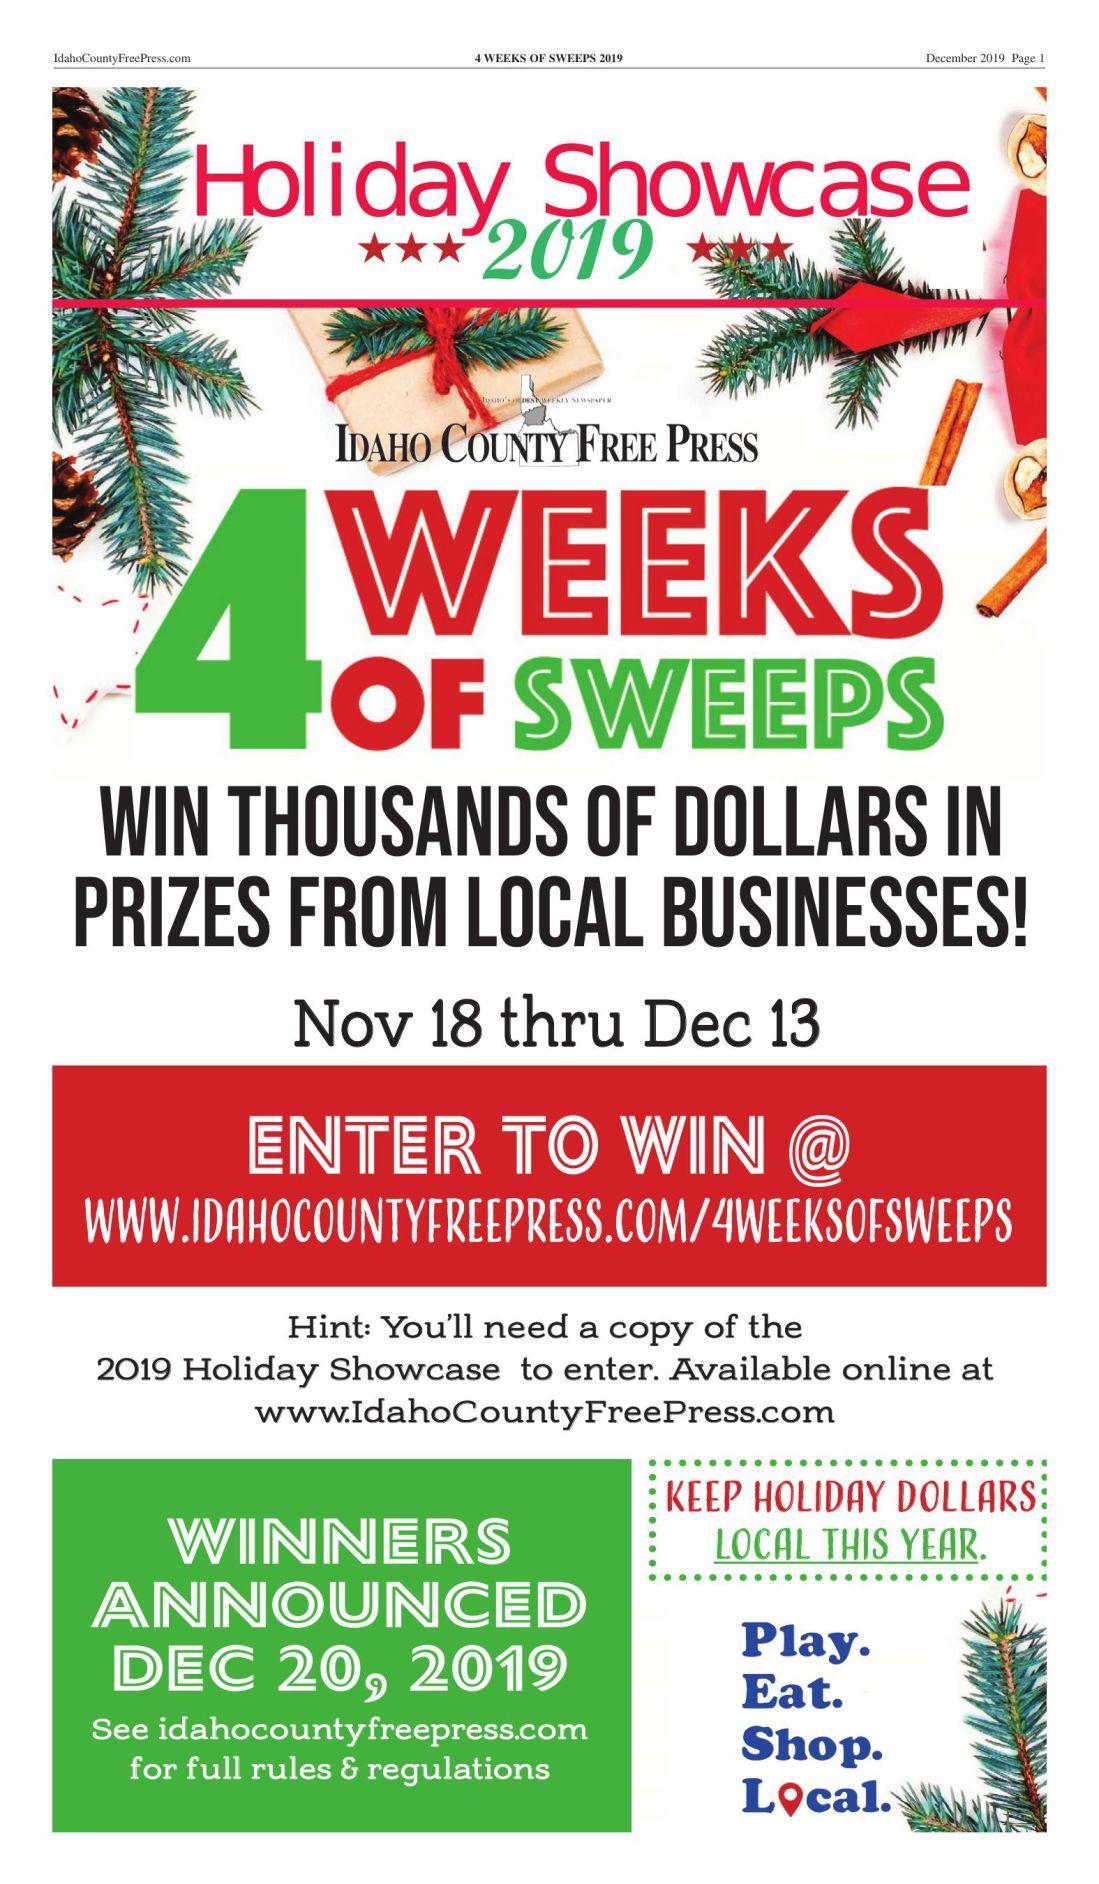 4 Weeks of Sweeps Holiday Showcase 2019